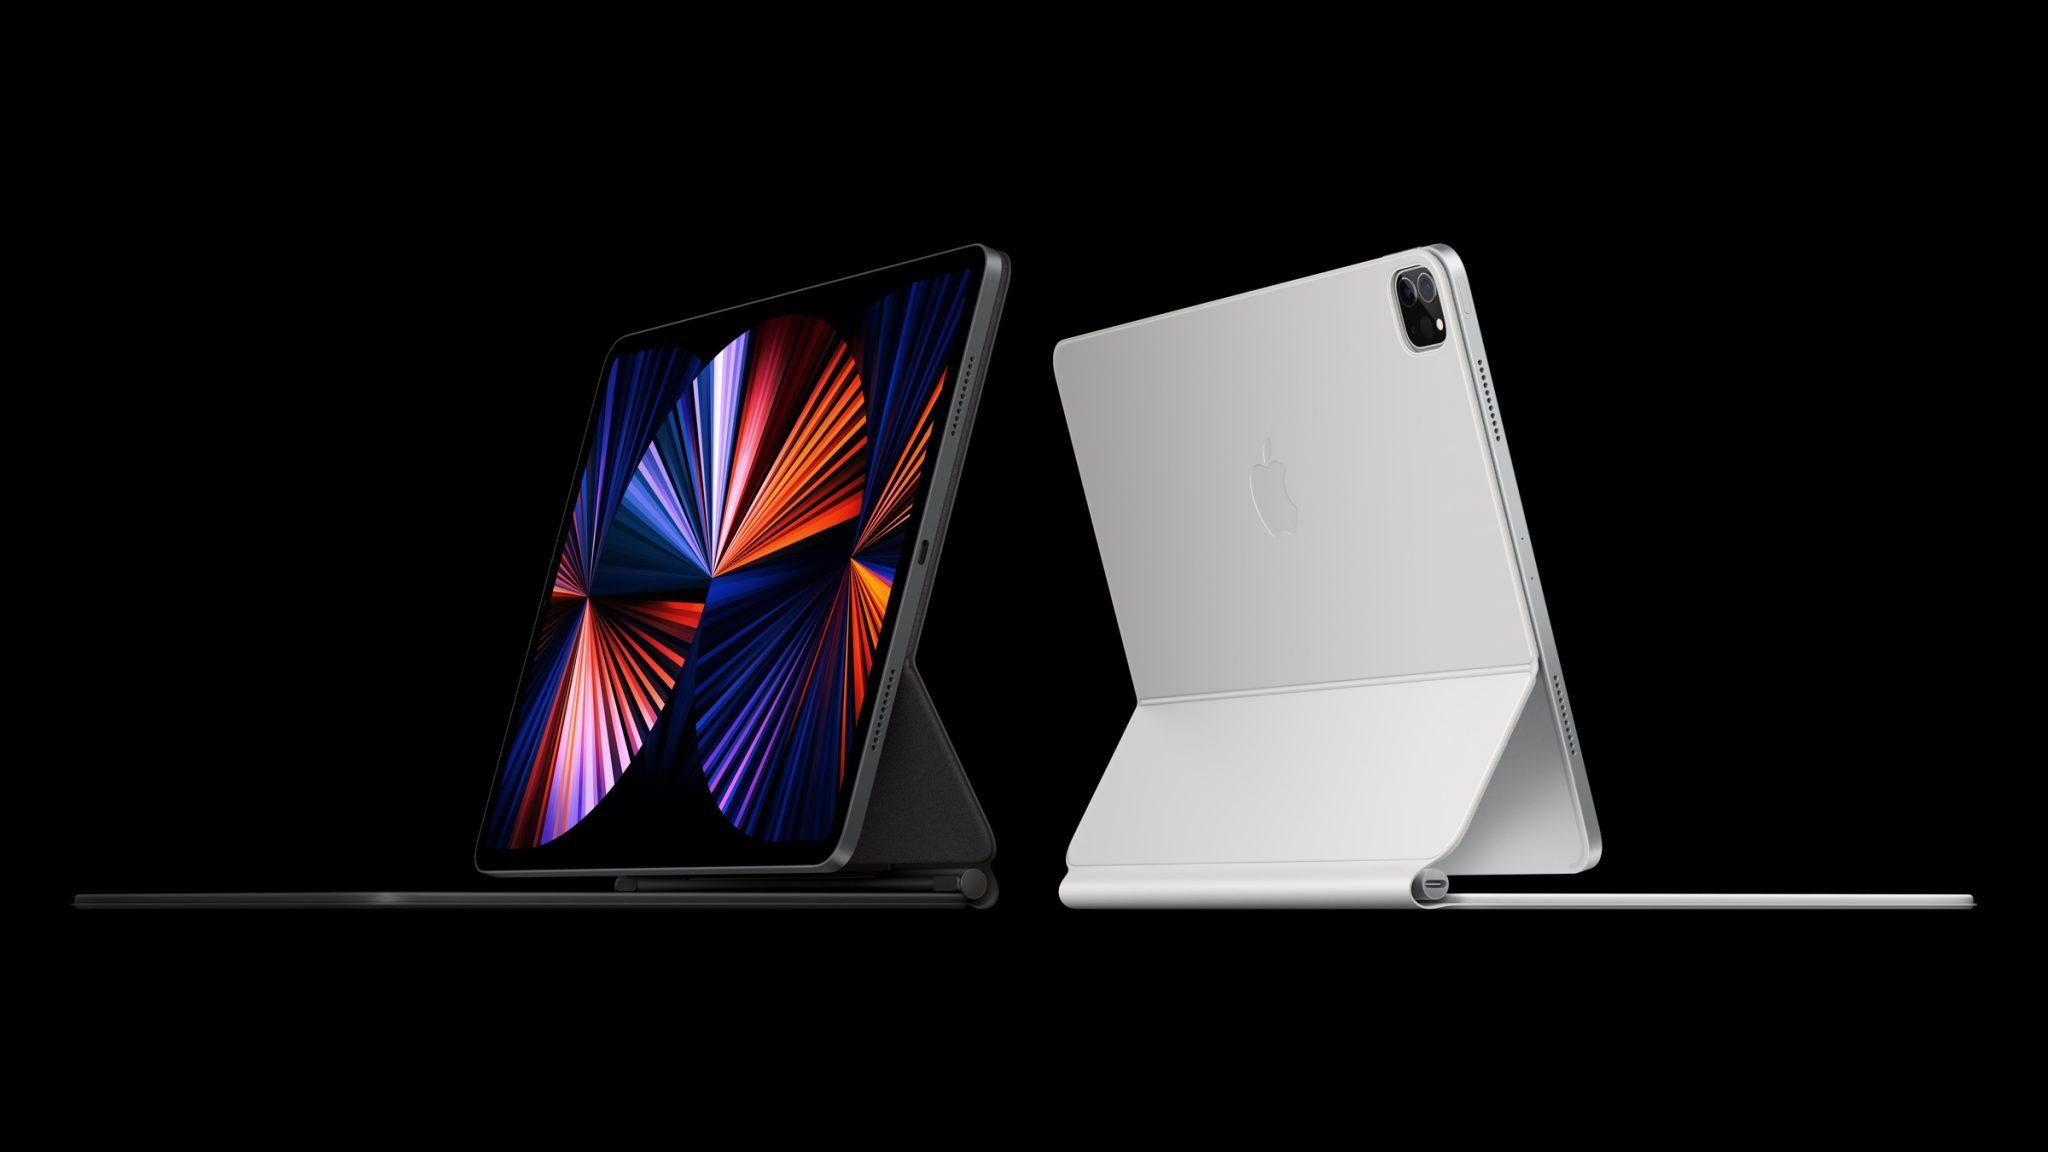 Apple porta il chip M1 sugli iPad Pro 2021, insieme al 5G e ai mini-LED 2